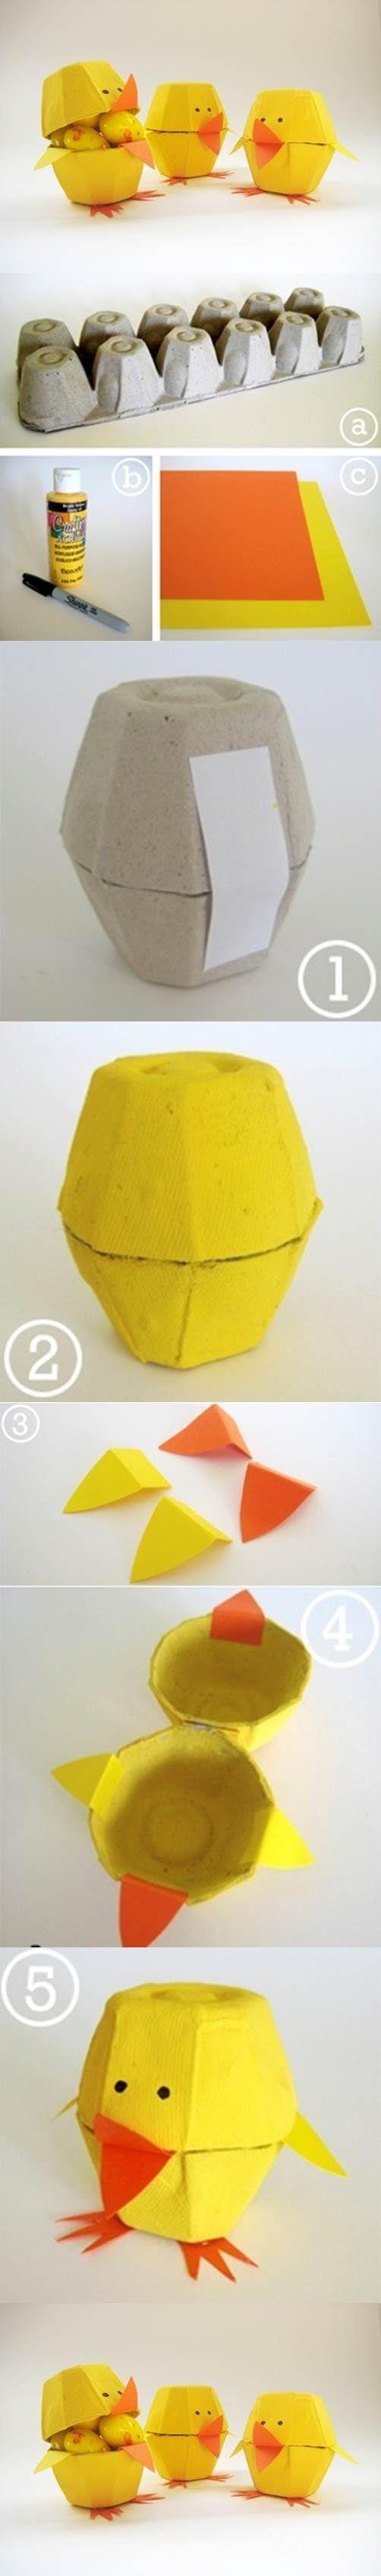 Egg Carton Craft - Lovely Chicks | iCreativeIdeas.com Like Us on Facebook ==> https://www.facebook.com/icreativeideas